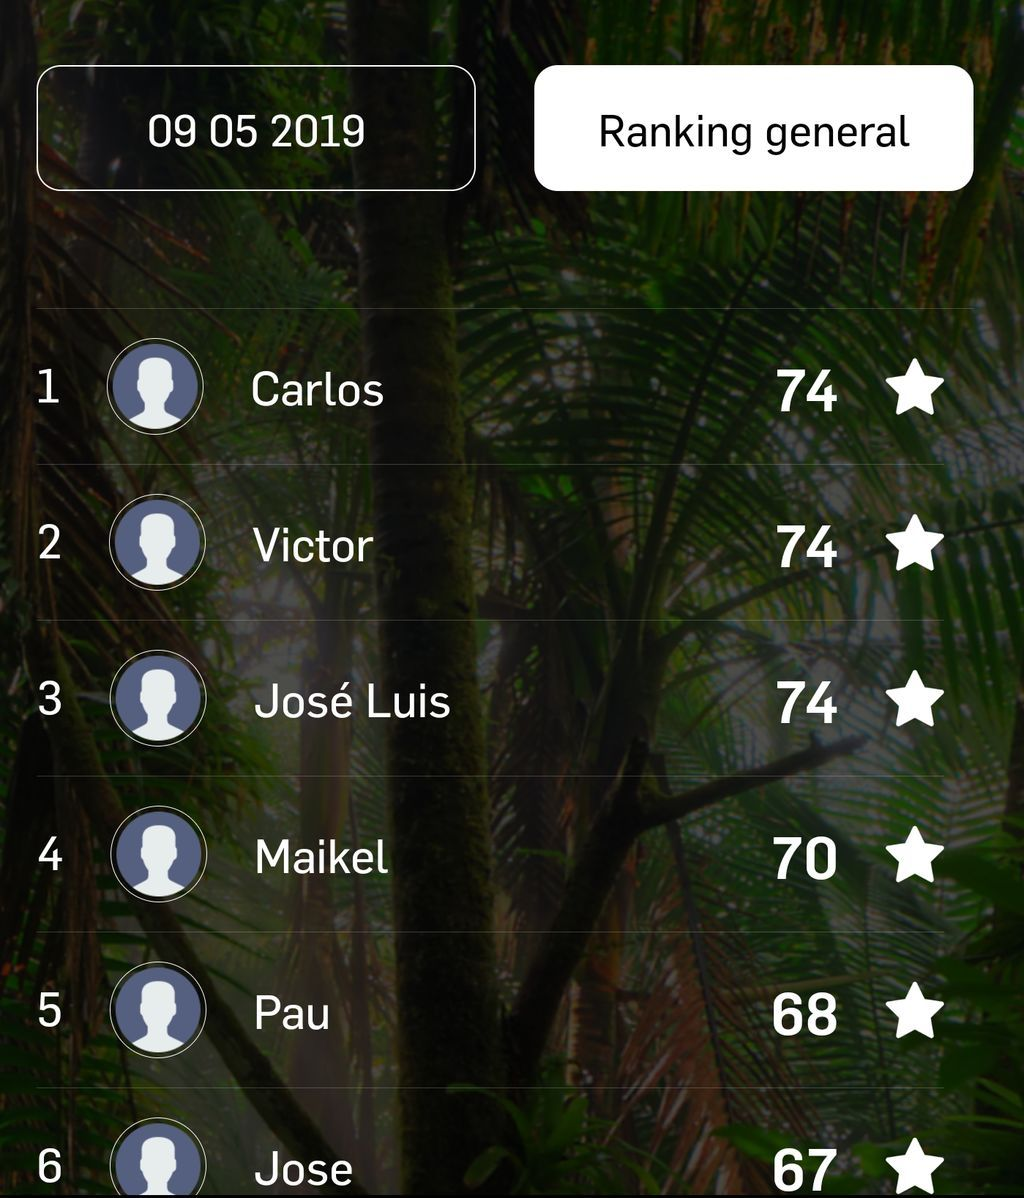 El ranking general del quiz de SV